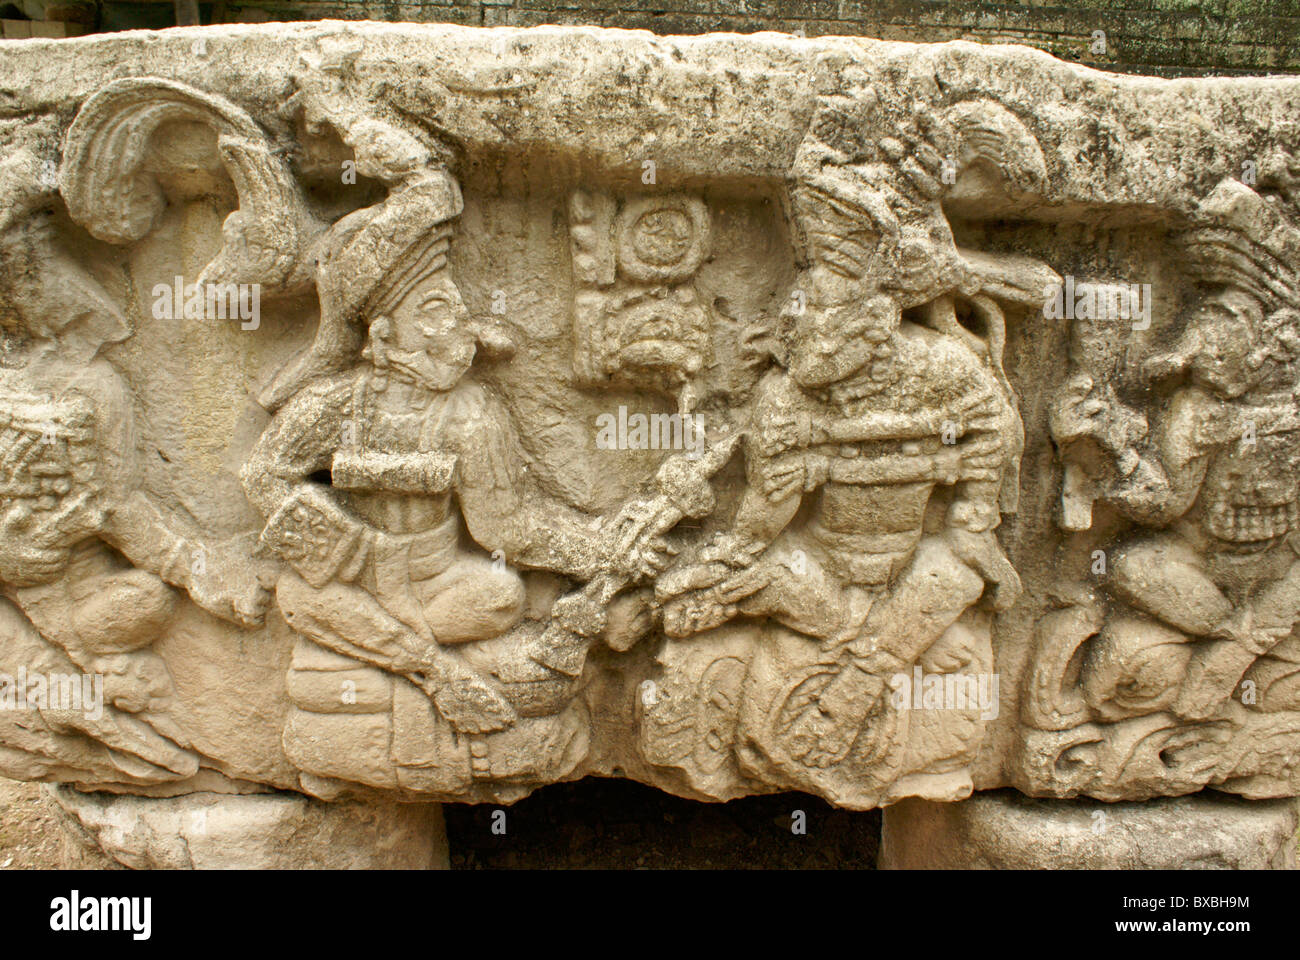 Altar Q showing the 16 rulers of the Mayan city of Copan, Copan ruins, Honduras - Stock Image